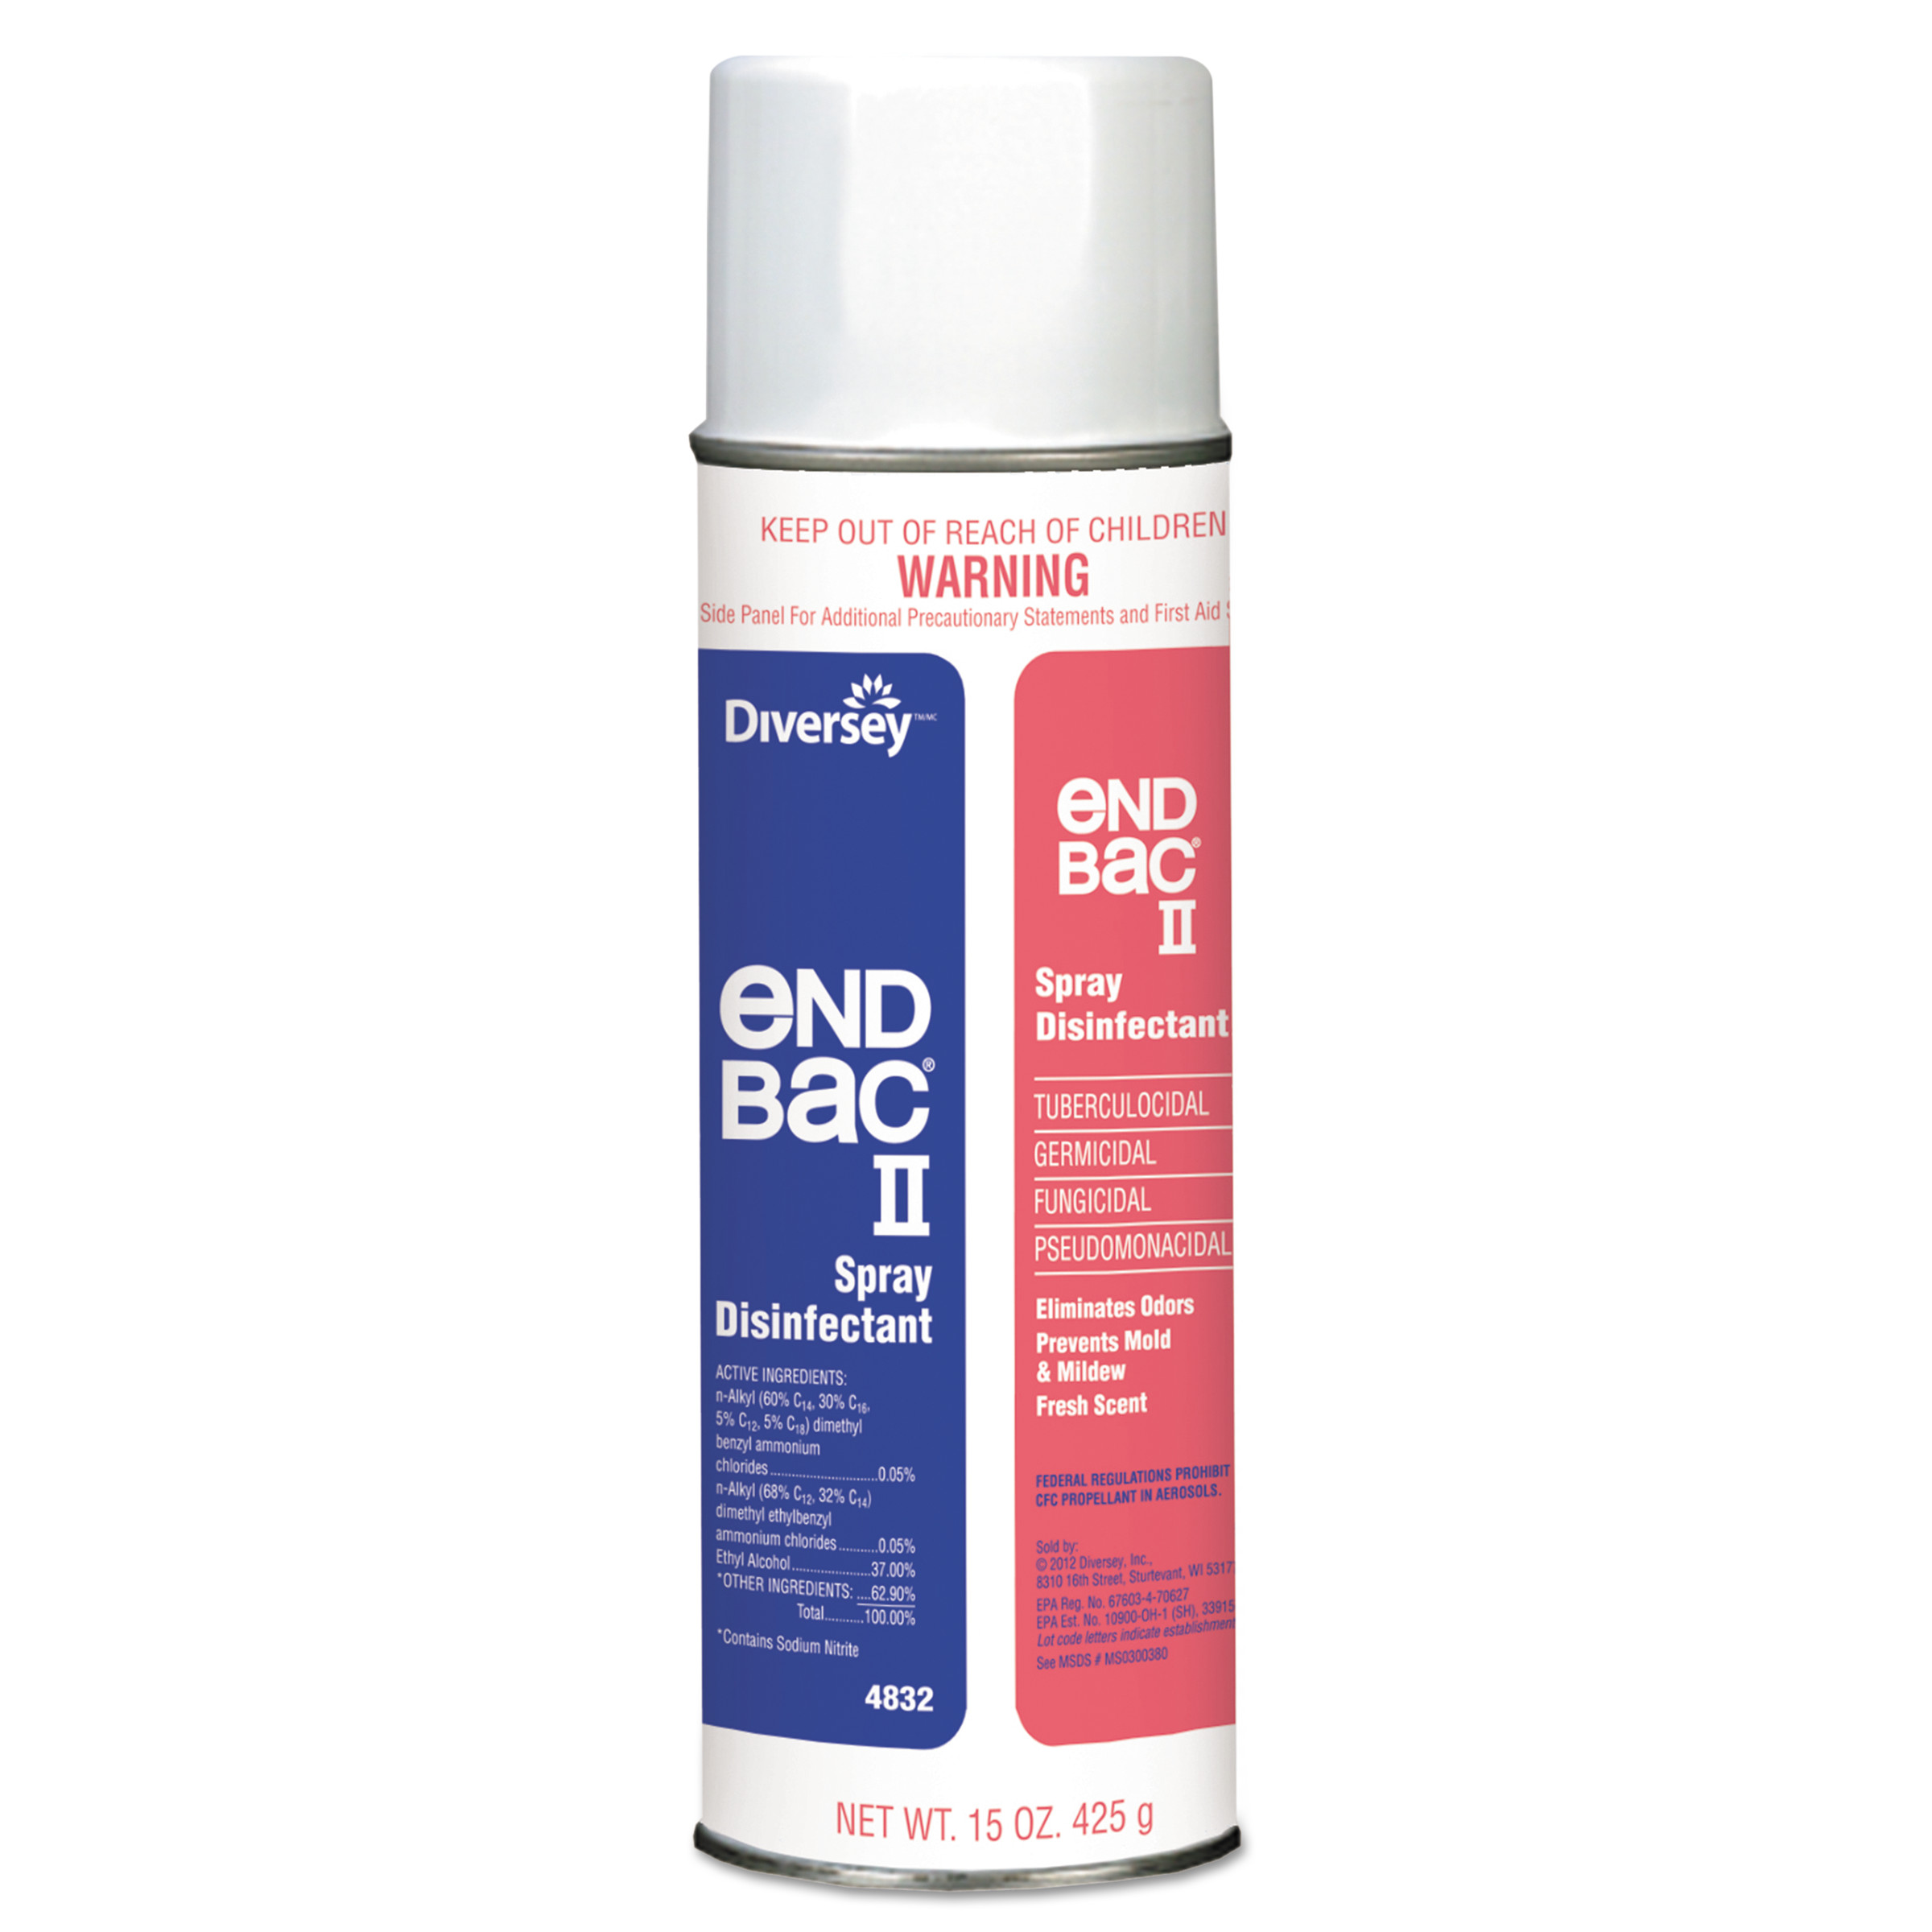 Diversey End Bac II Spray Disinfectant, Unscented, 15 oz Aerosol, 12/Carton